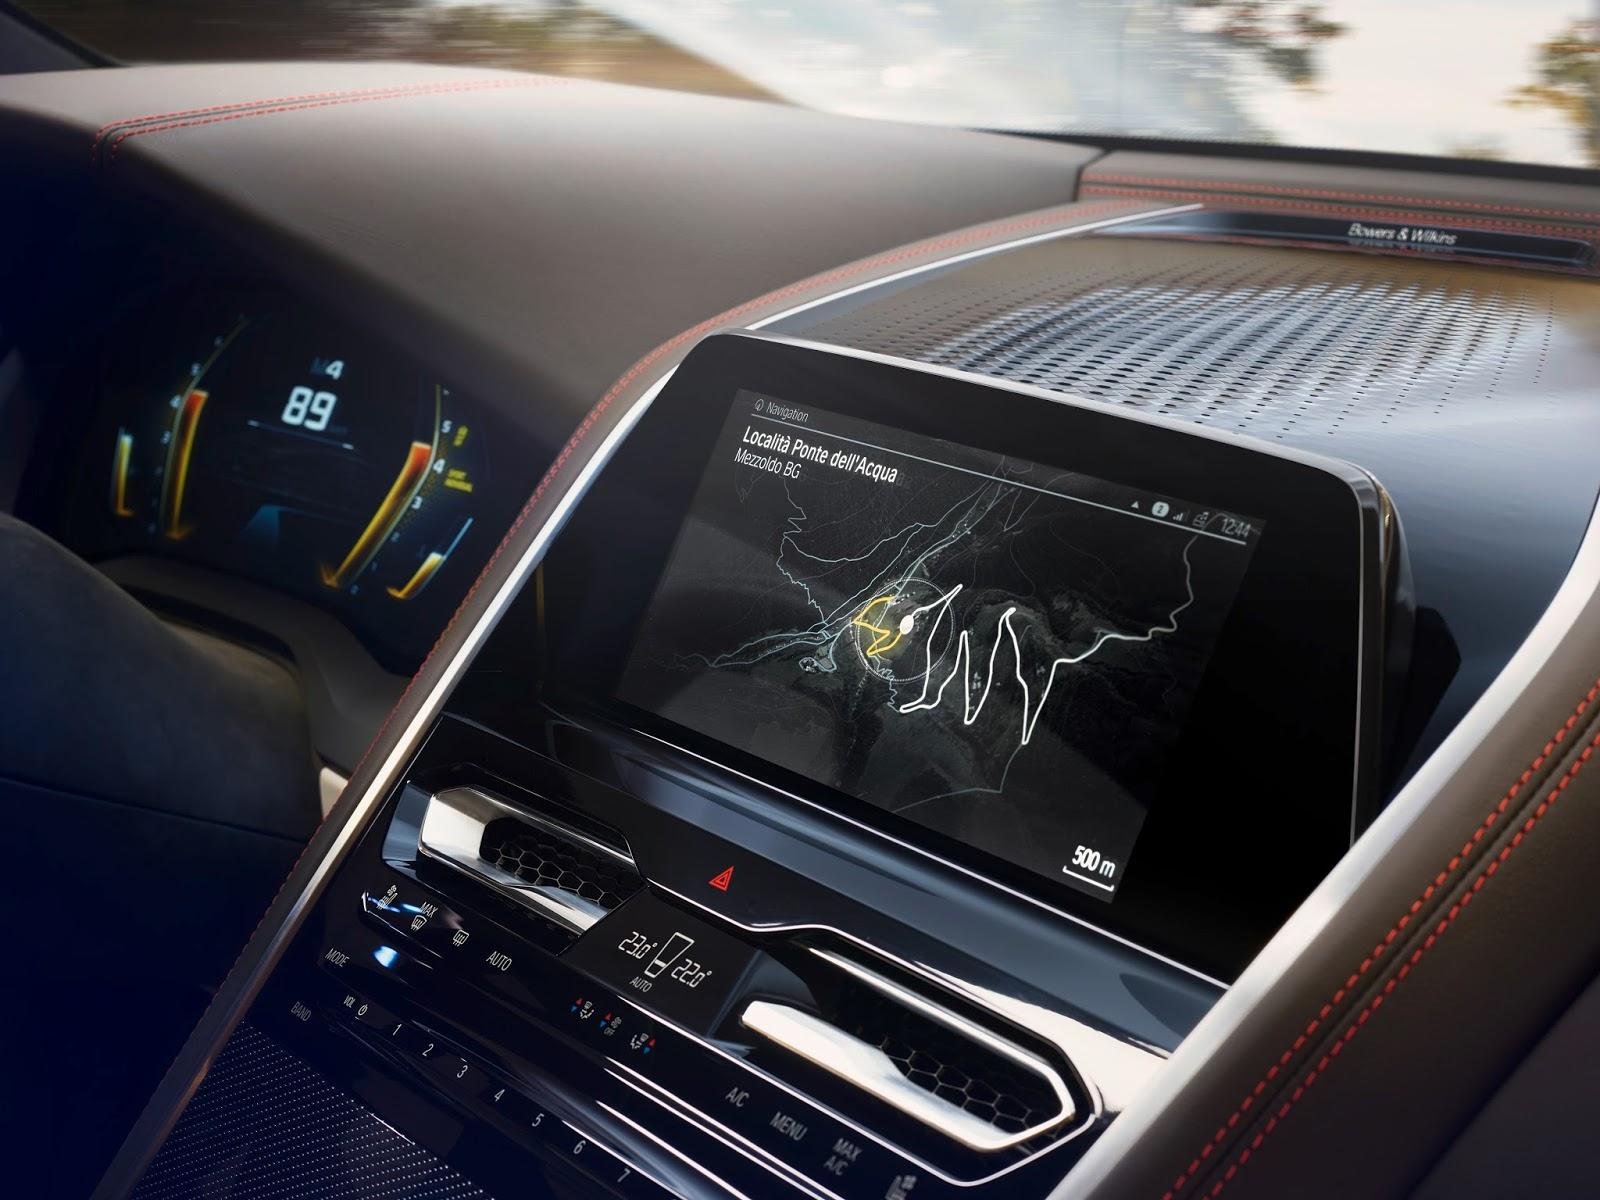 P90261165 highRes bmw concept 8 series Η BMW Σειρά 8 Coupe είναι η πεμπτουσία των μελλοντικών σπορ αυτοκινήτων BMW, BMW 8, BMW Concept, BMW Concept 8 Series, COUPE, dream car